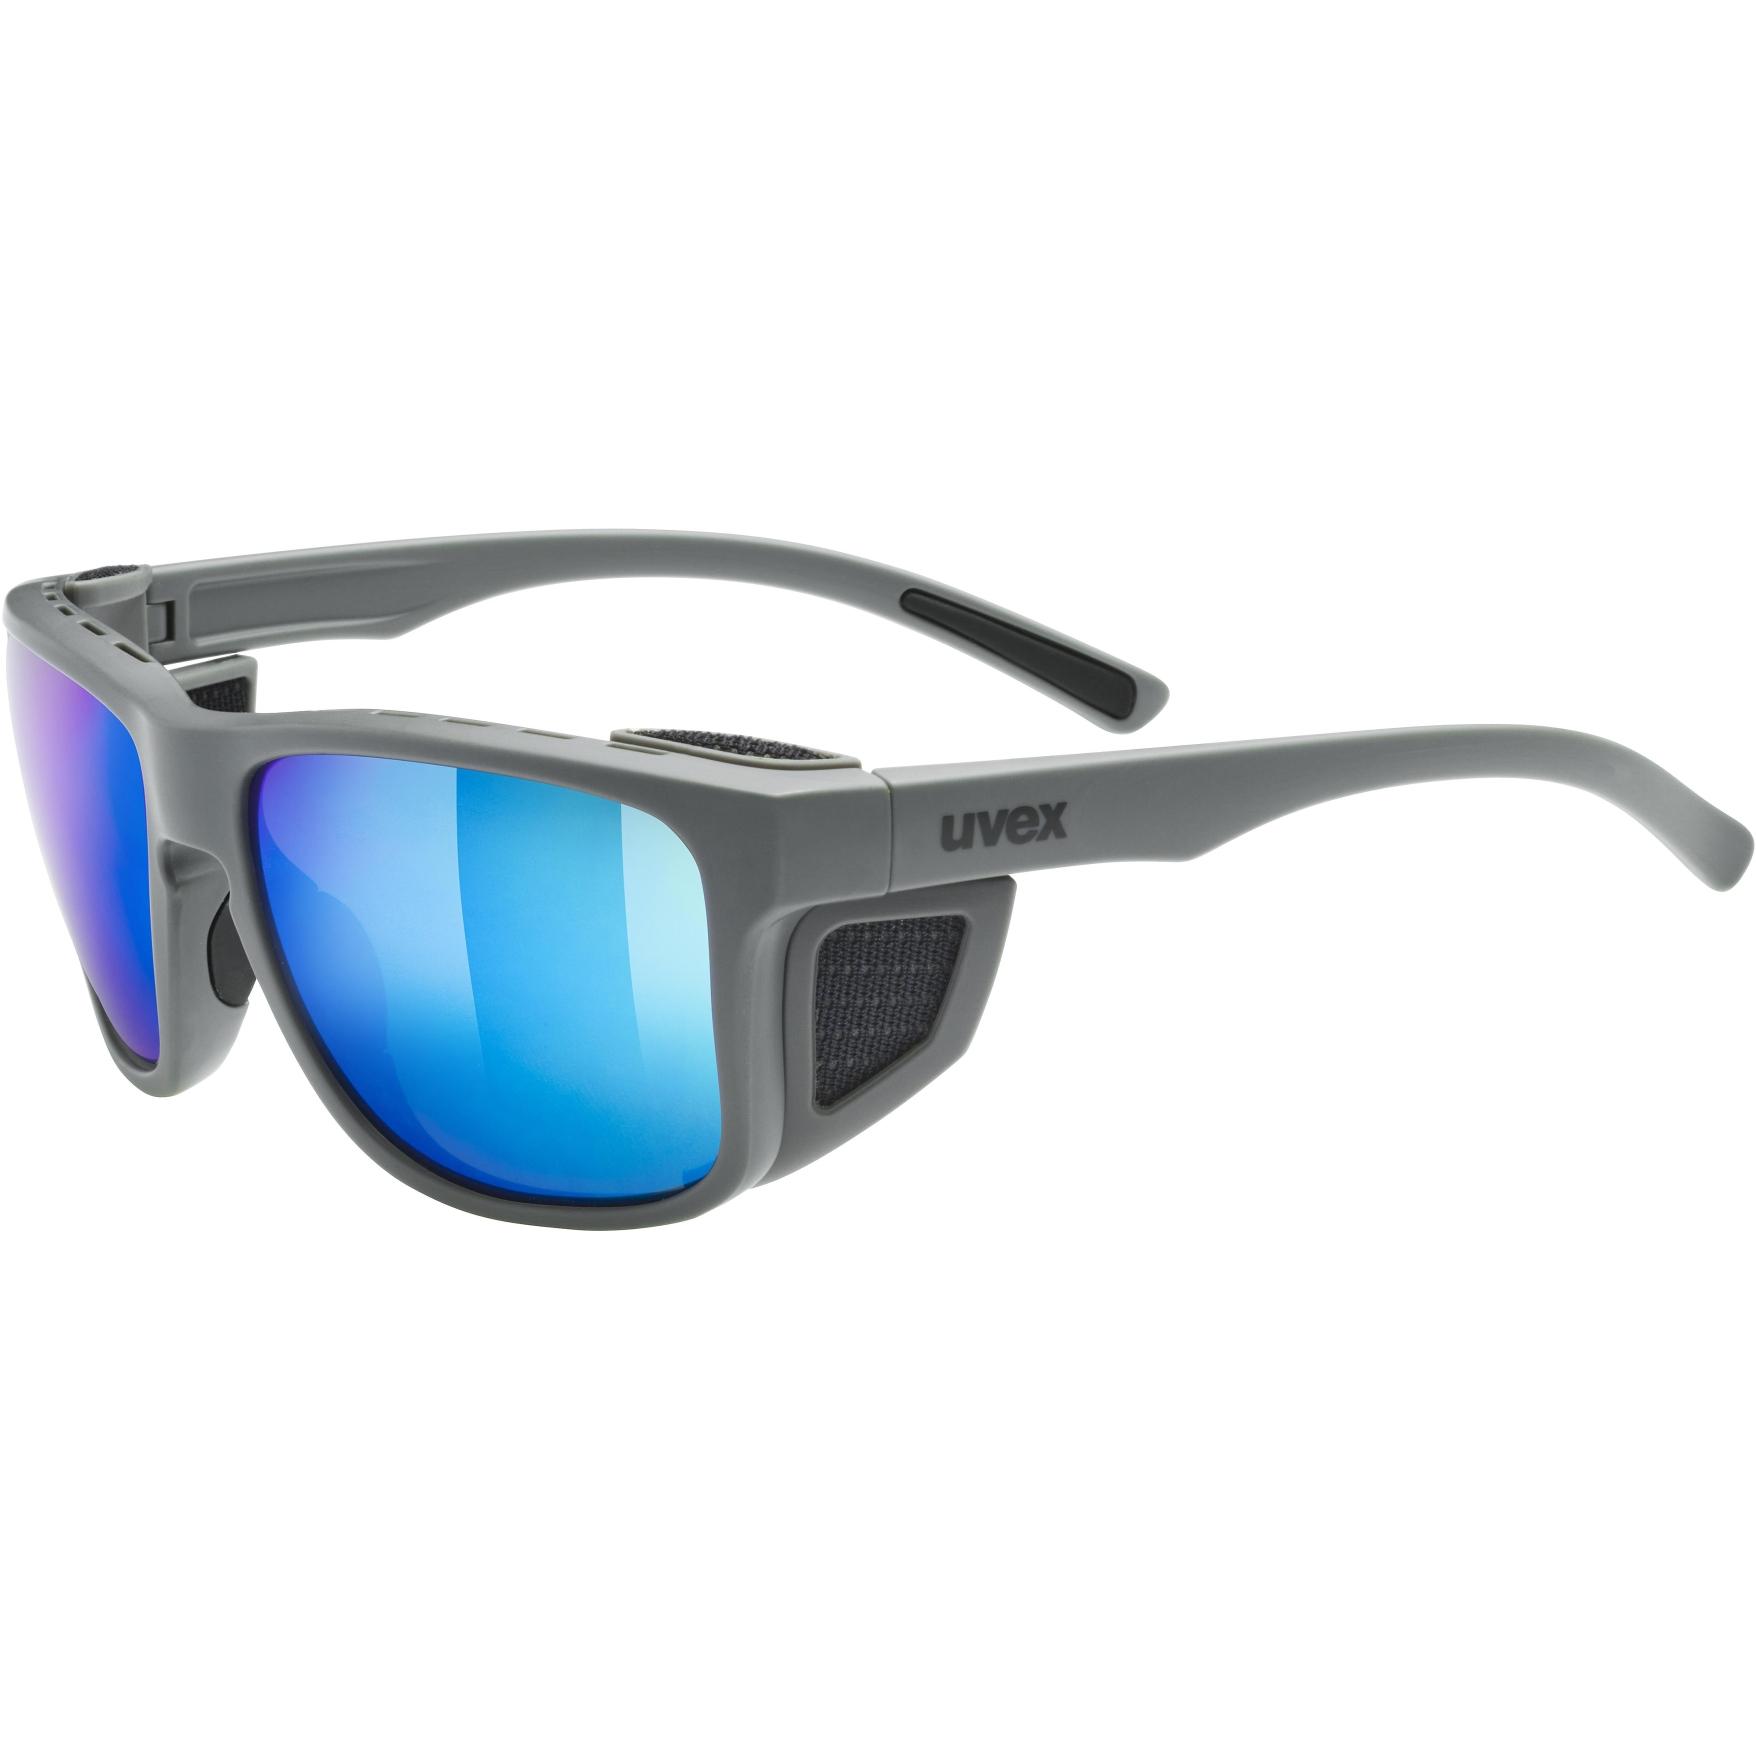 Uvex sportstyle 312 Glasses - rhino mat/mirror blue